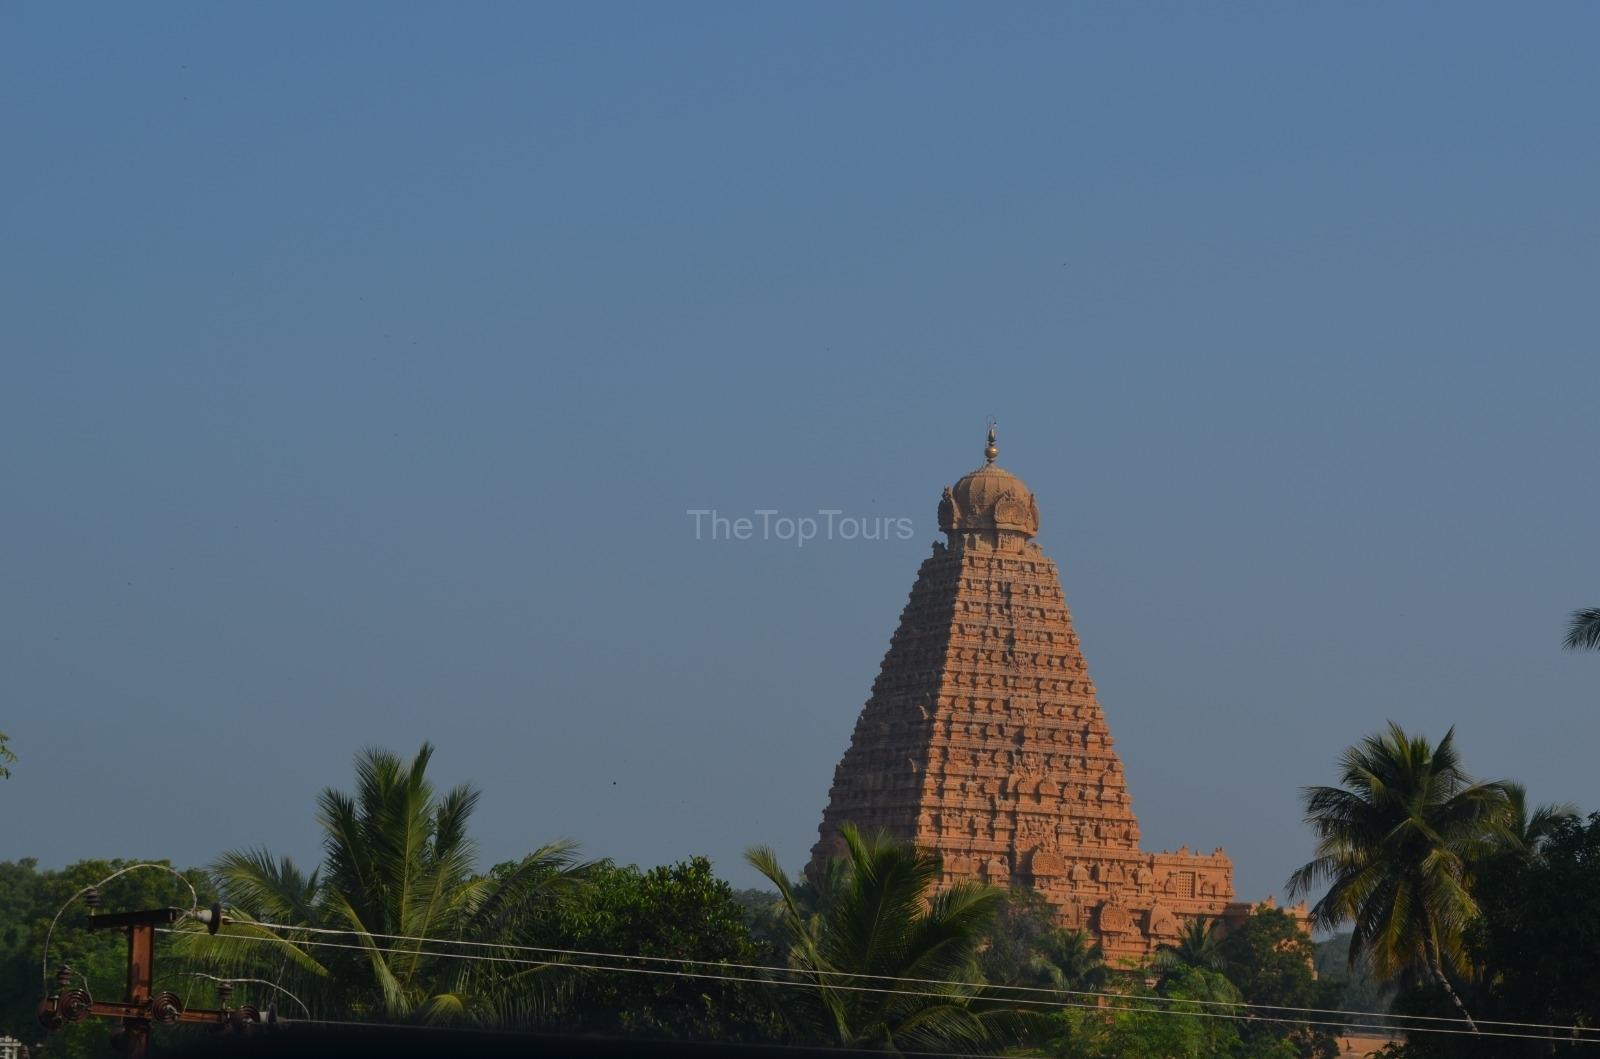 brihadeeswarar-temple-at-thanjavur-tamil-nadu